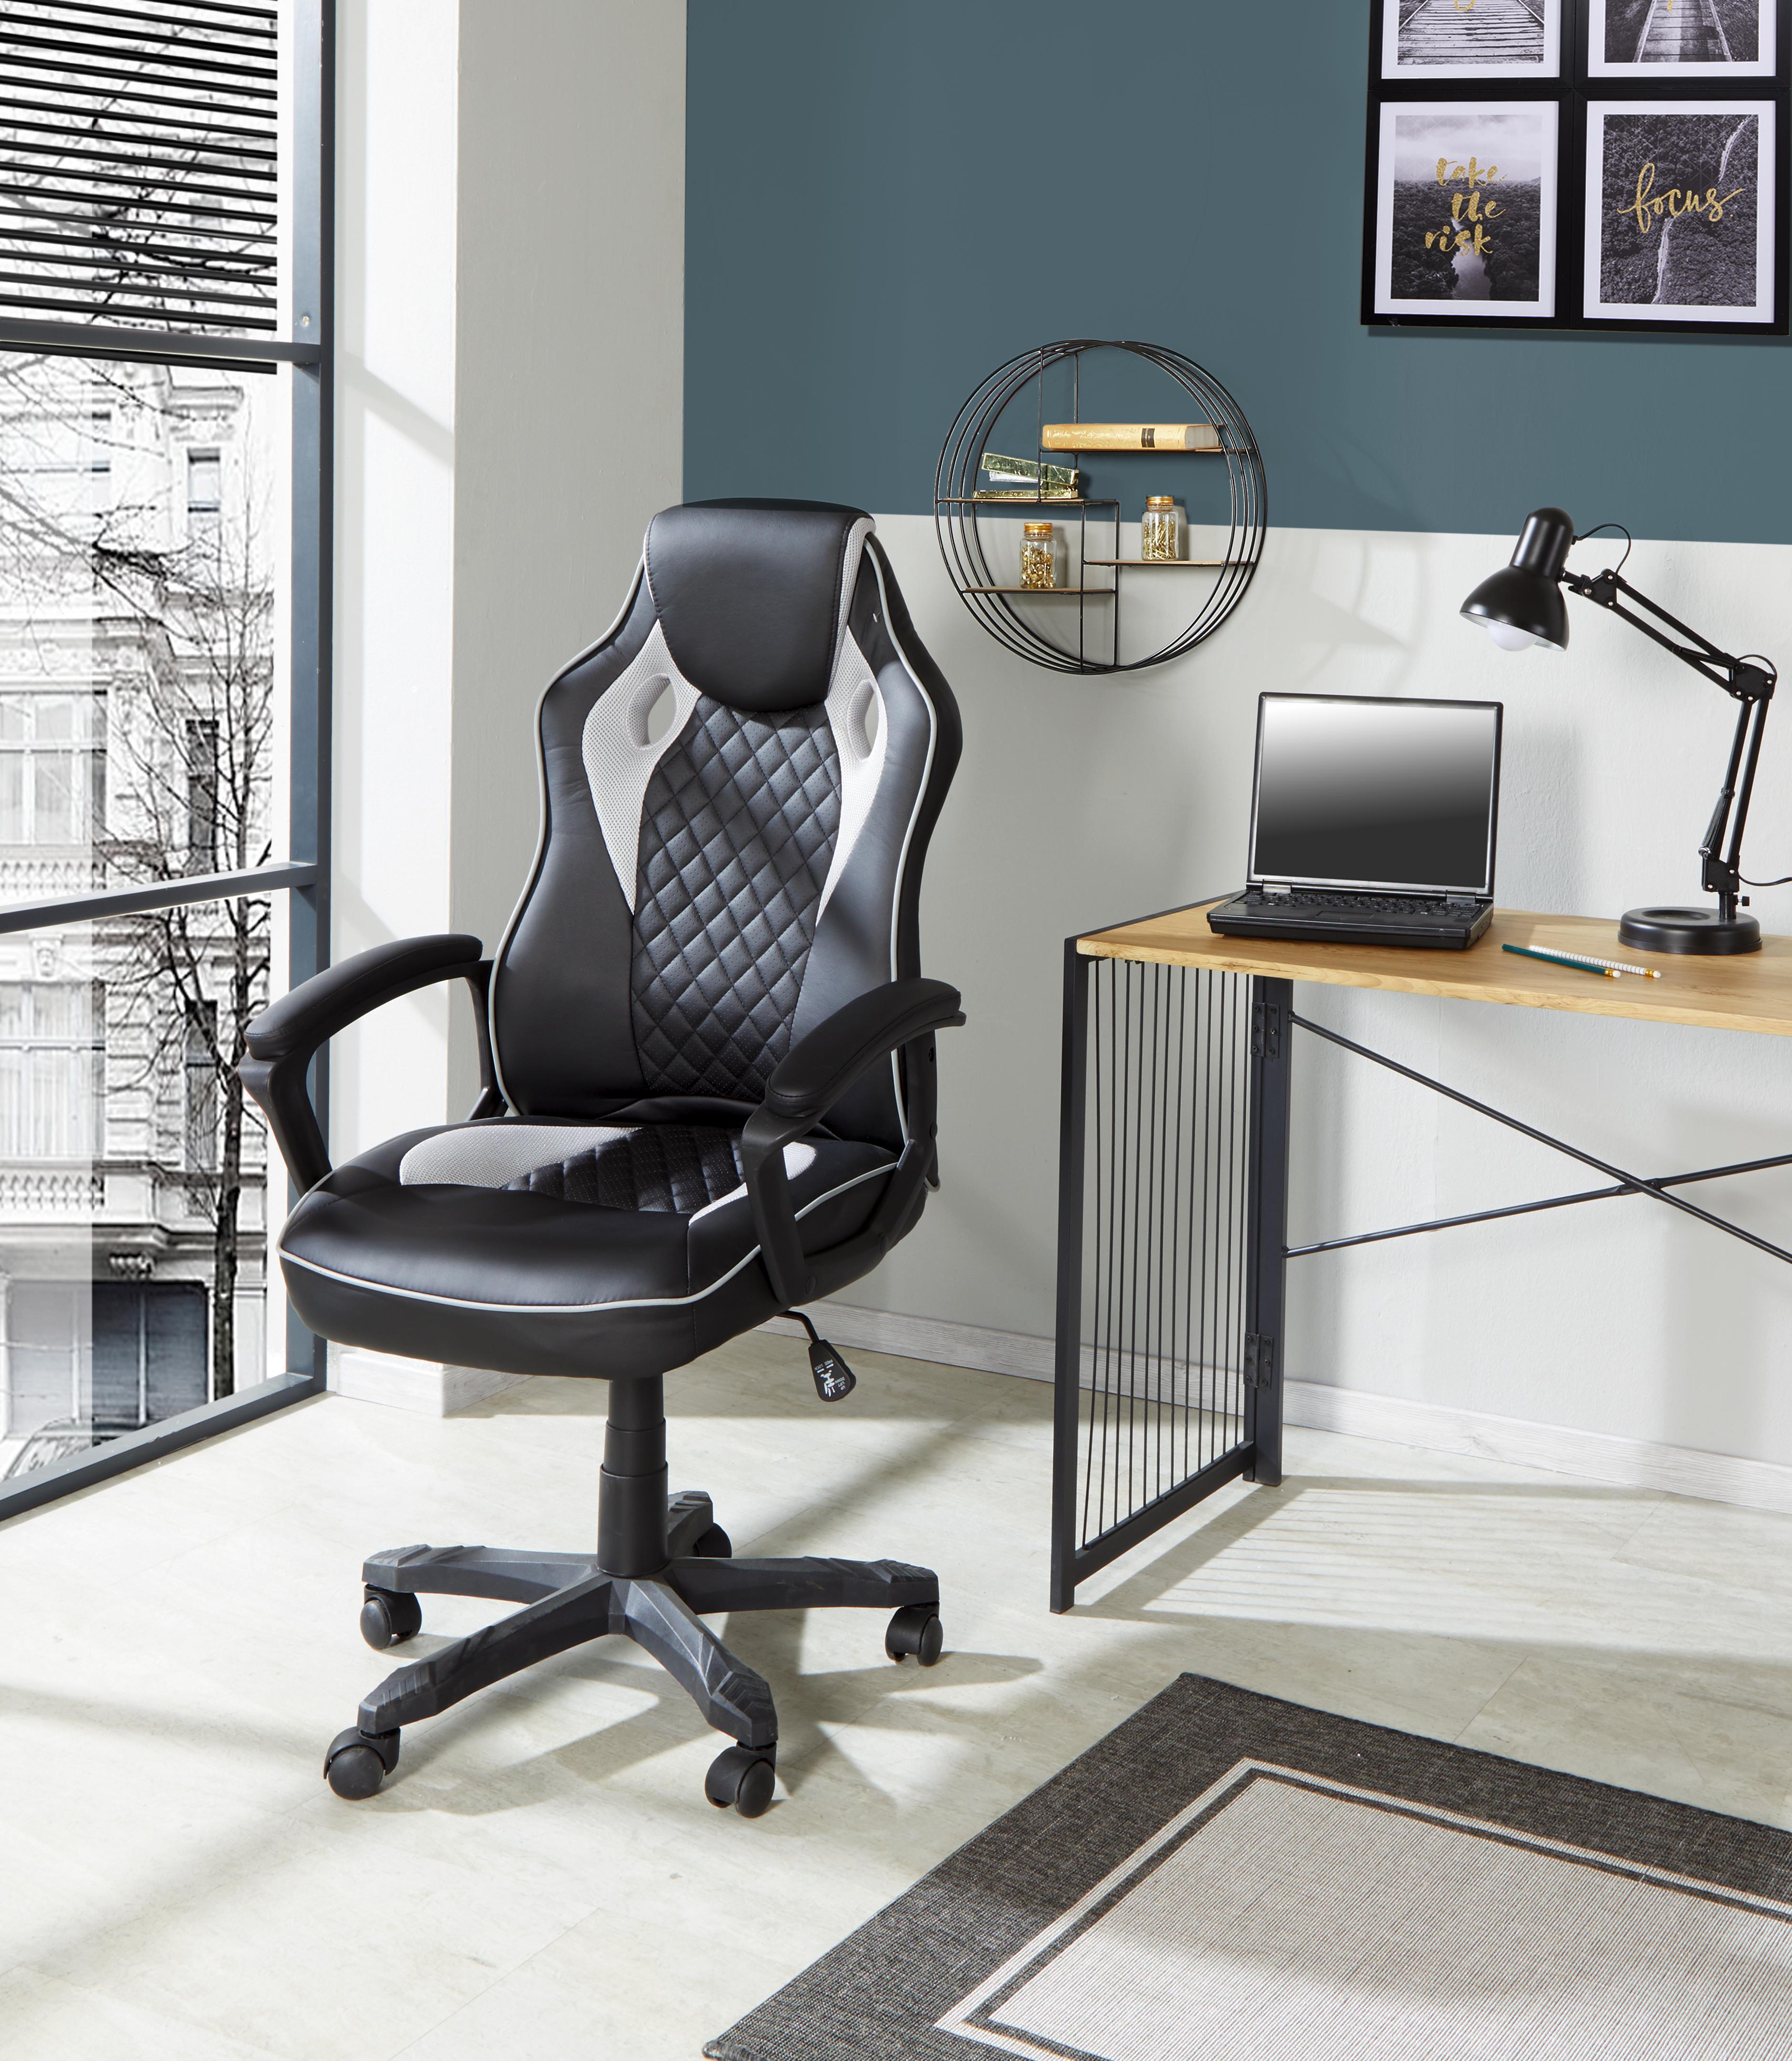 Top-Komfort: Relaxed arbeiten im Chefsessel Marco